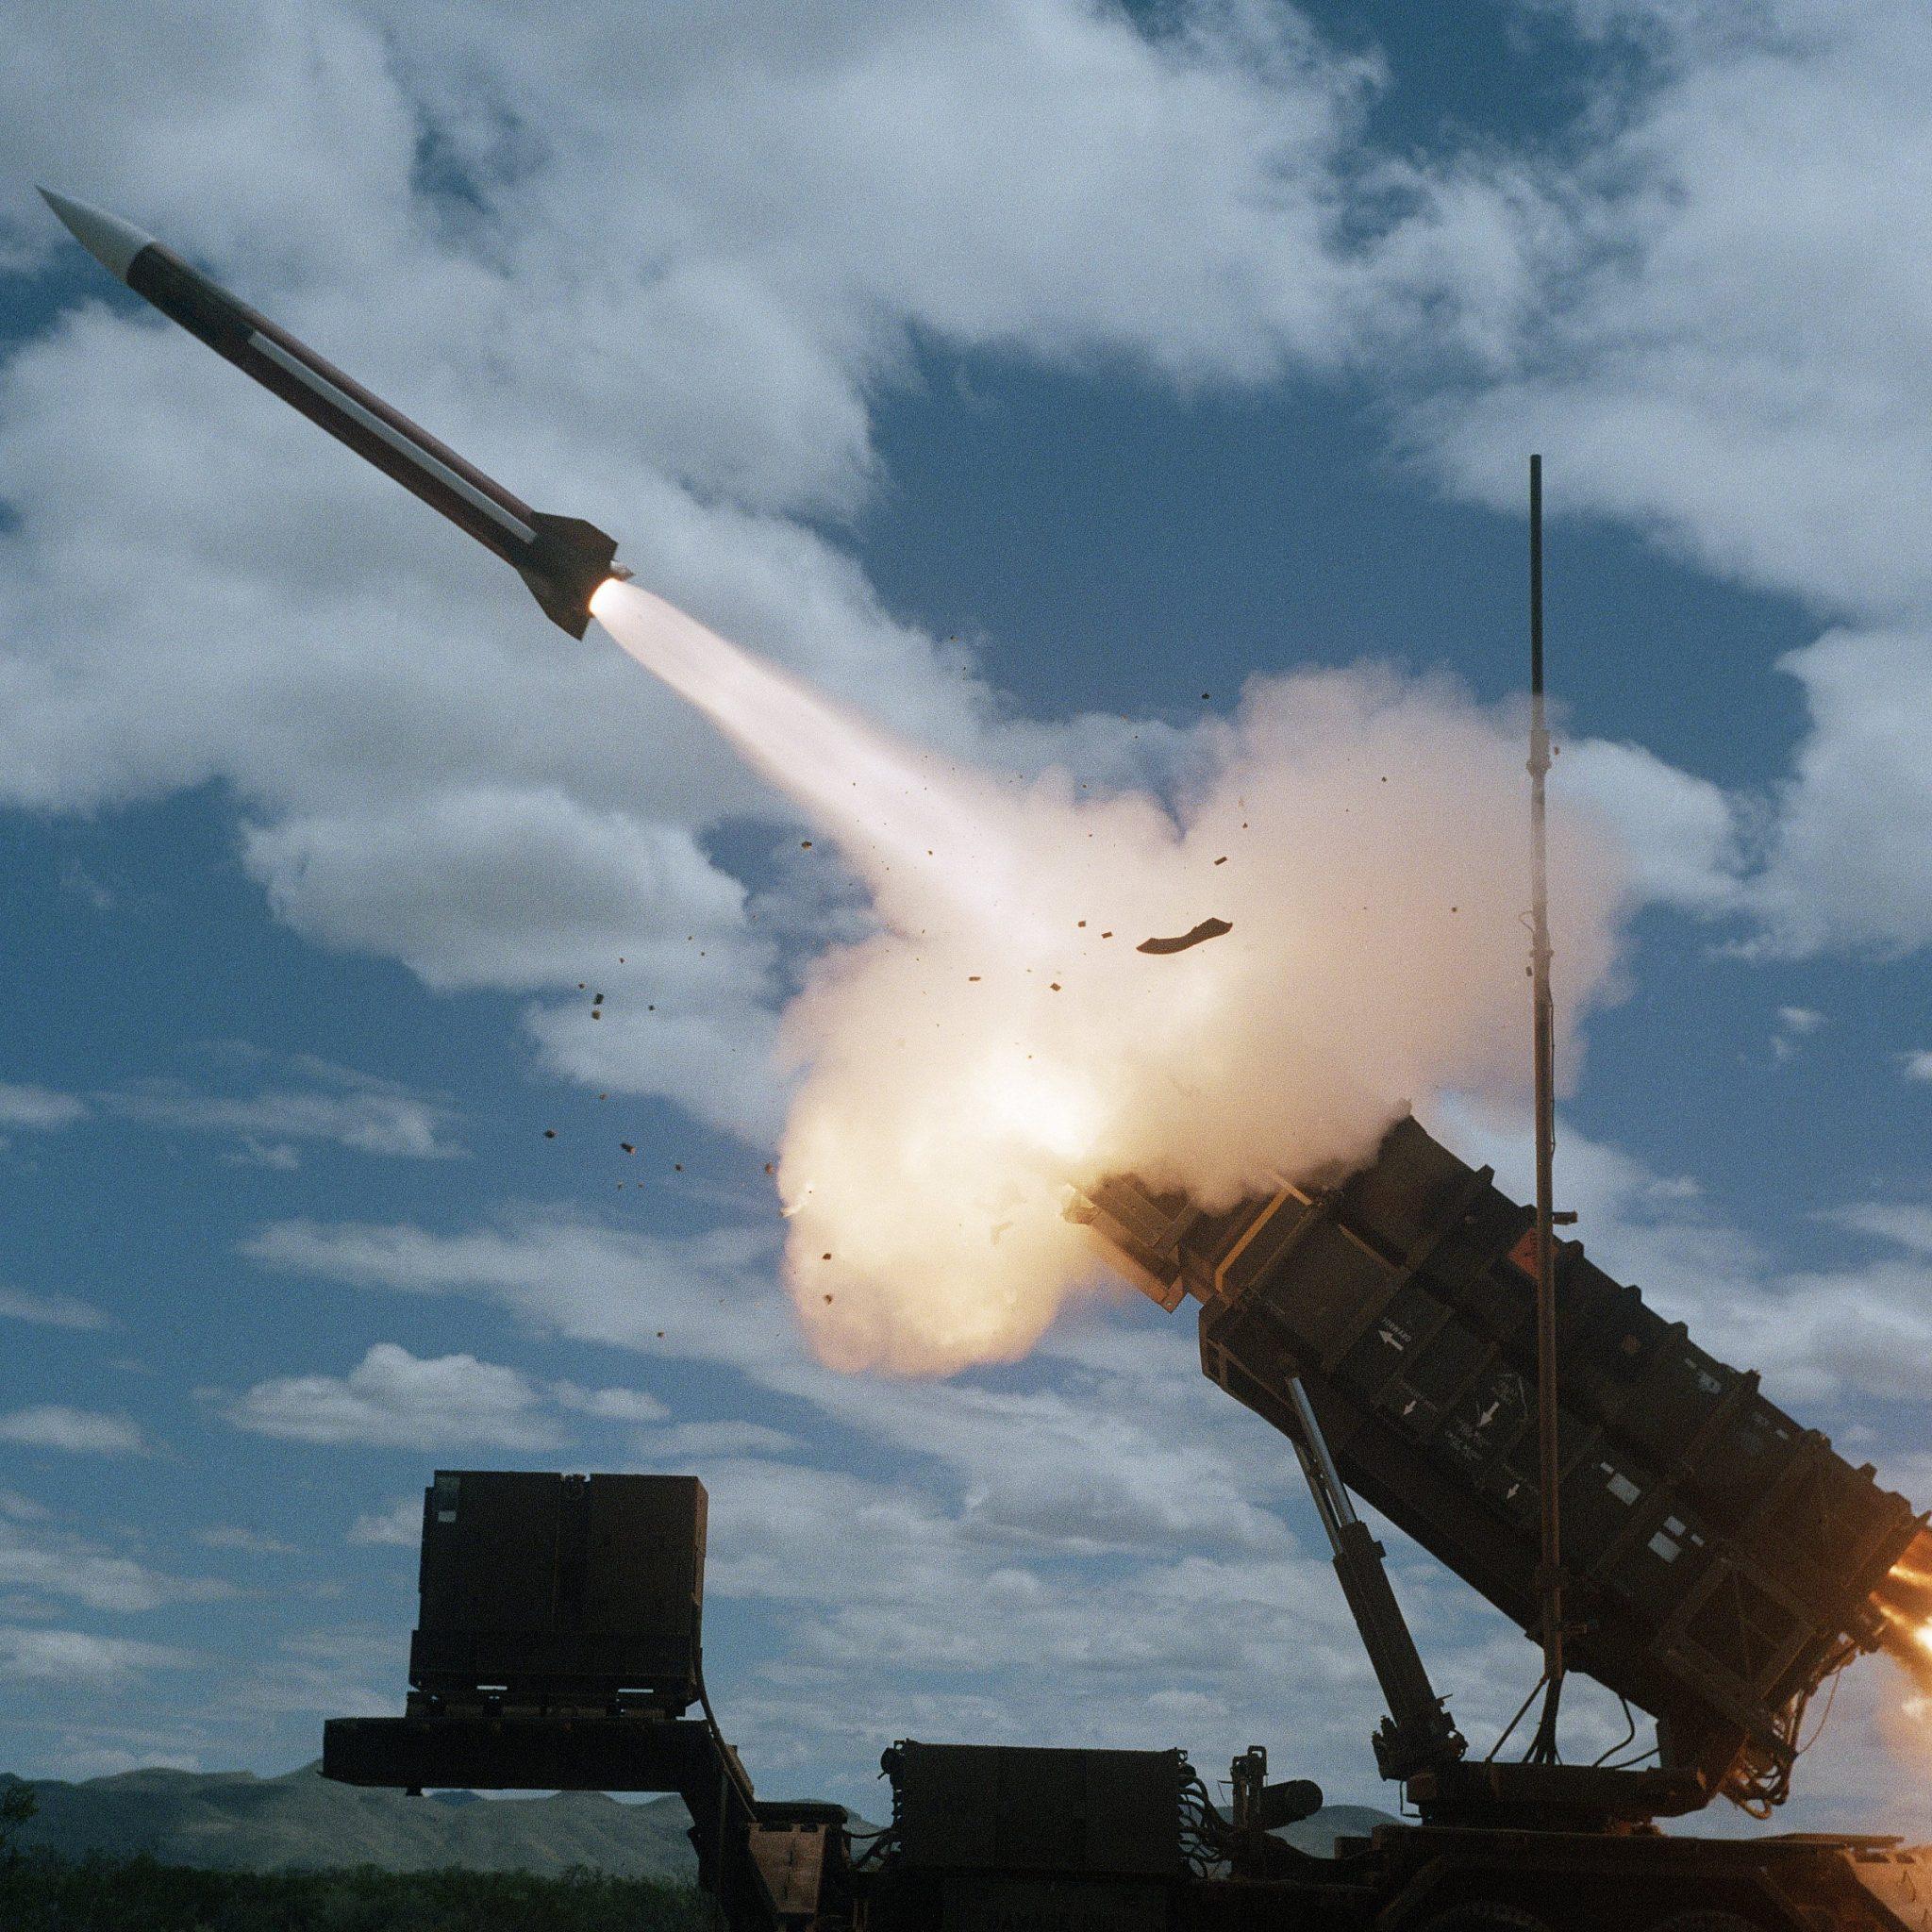 Aircraft Carrier Hd Wallpaper Missile Launch Hd Wallpaper